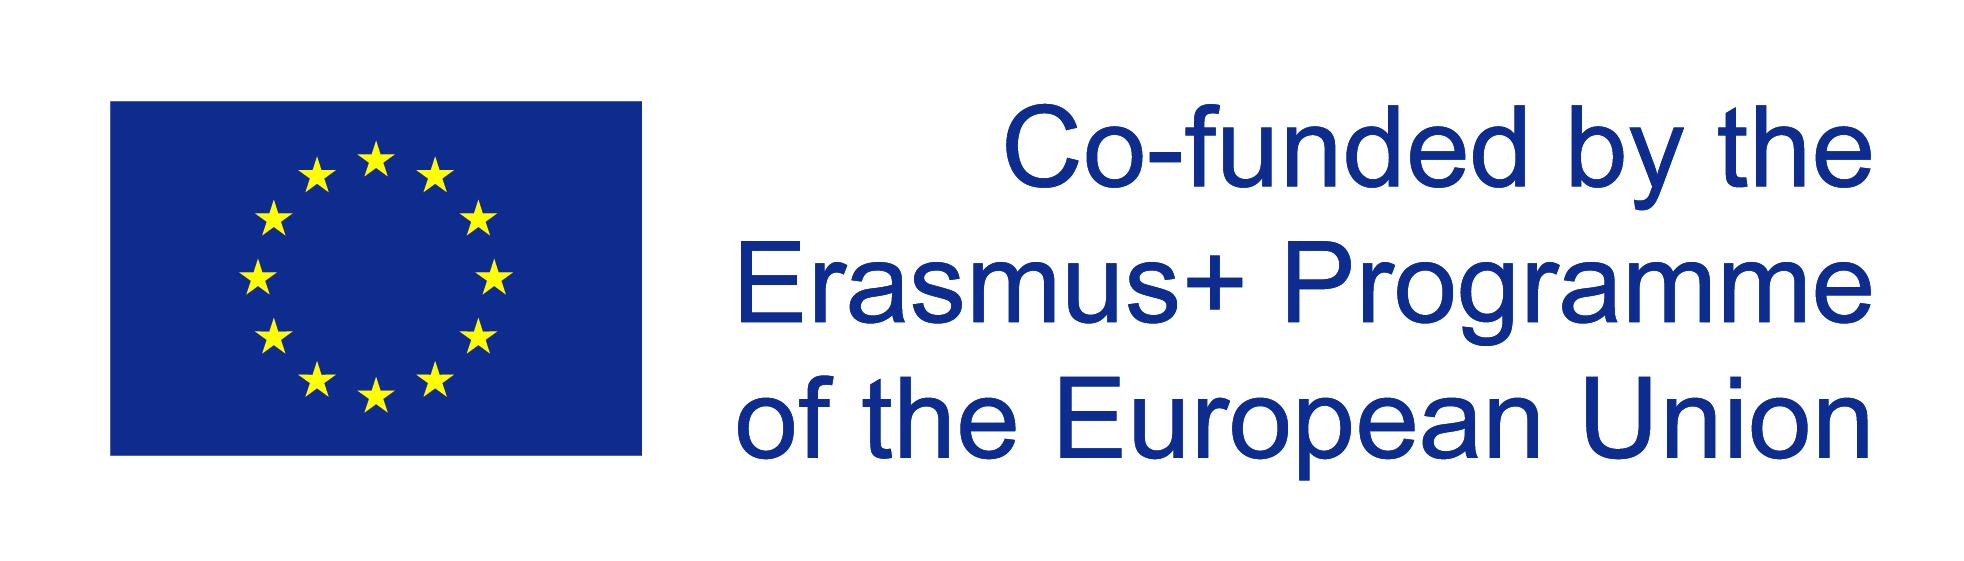 Erasmus+ Founding